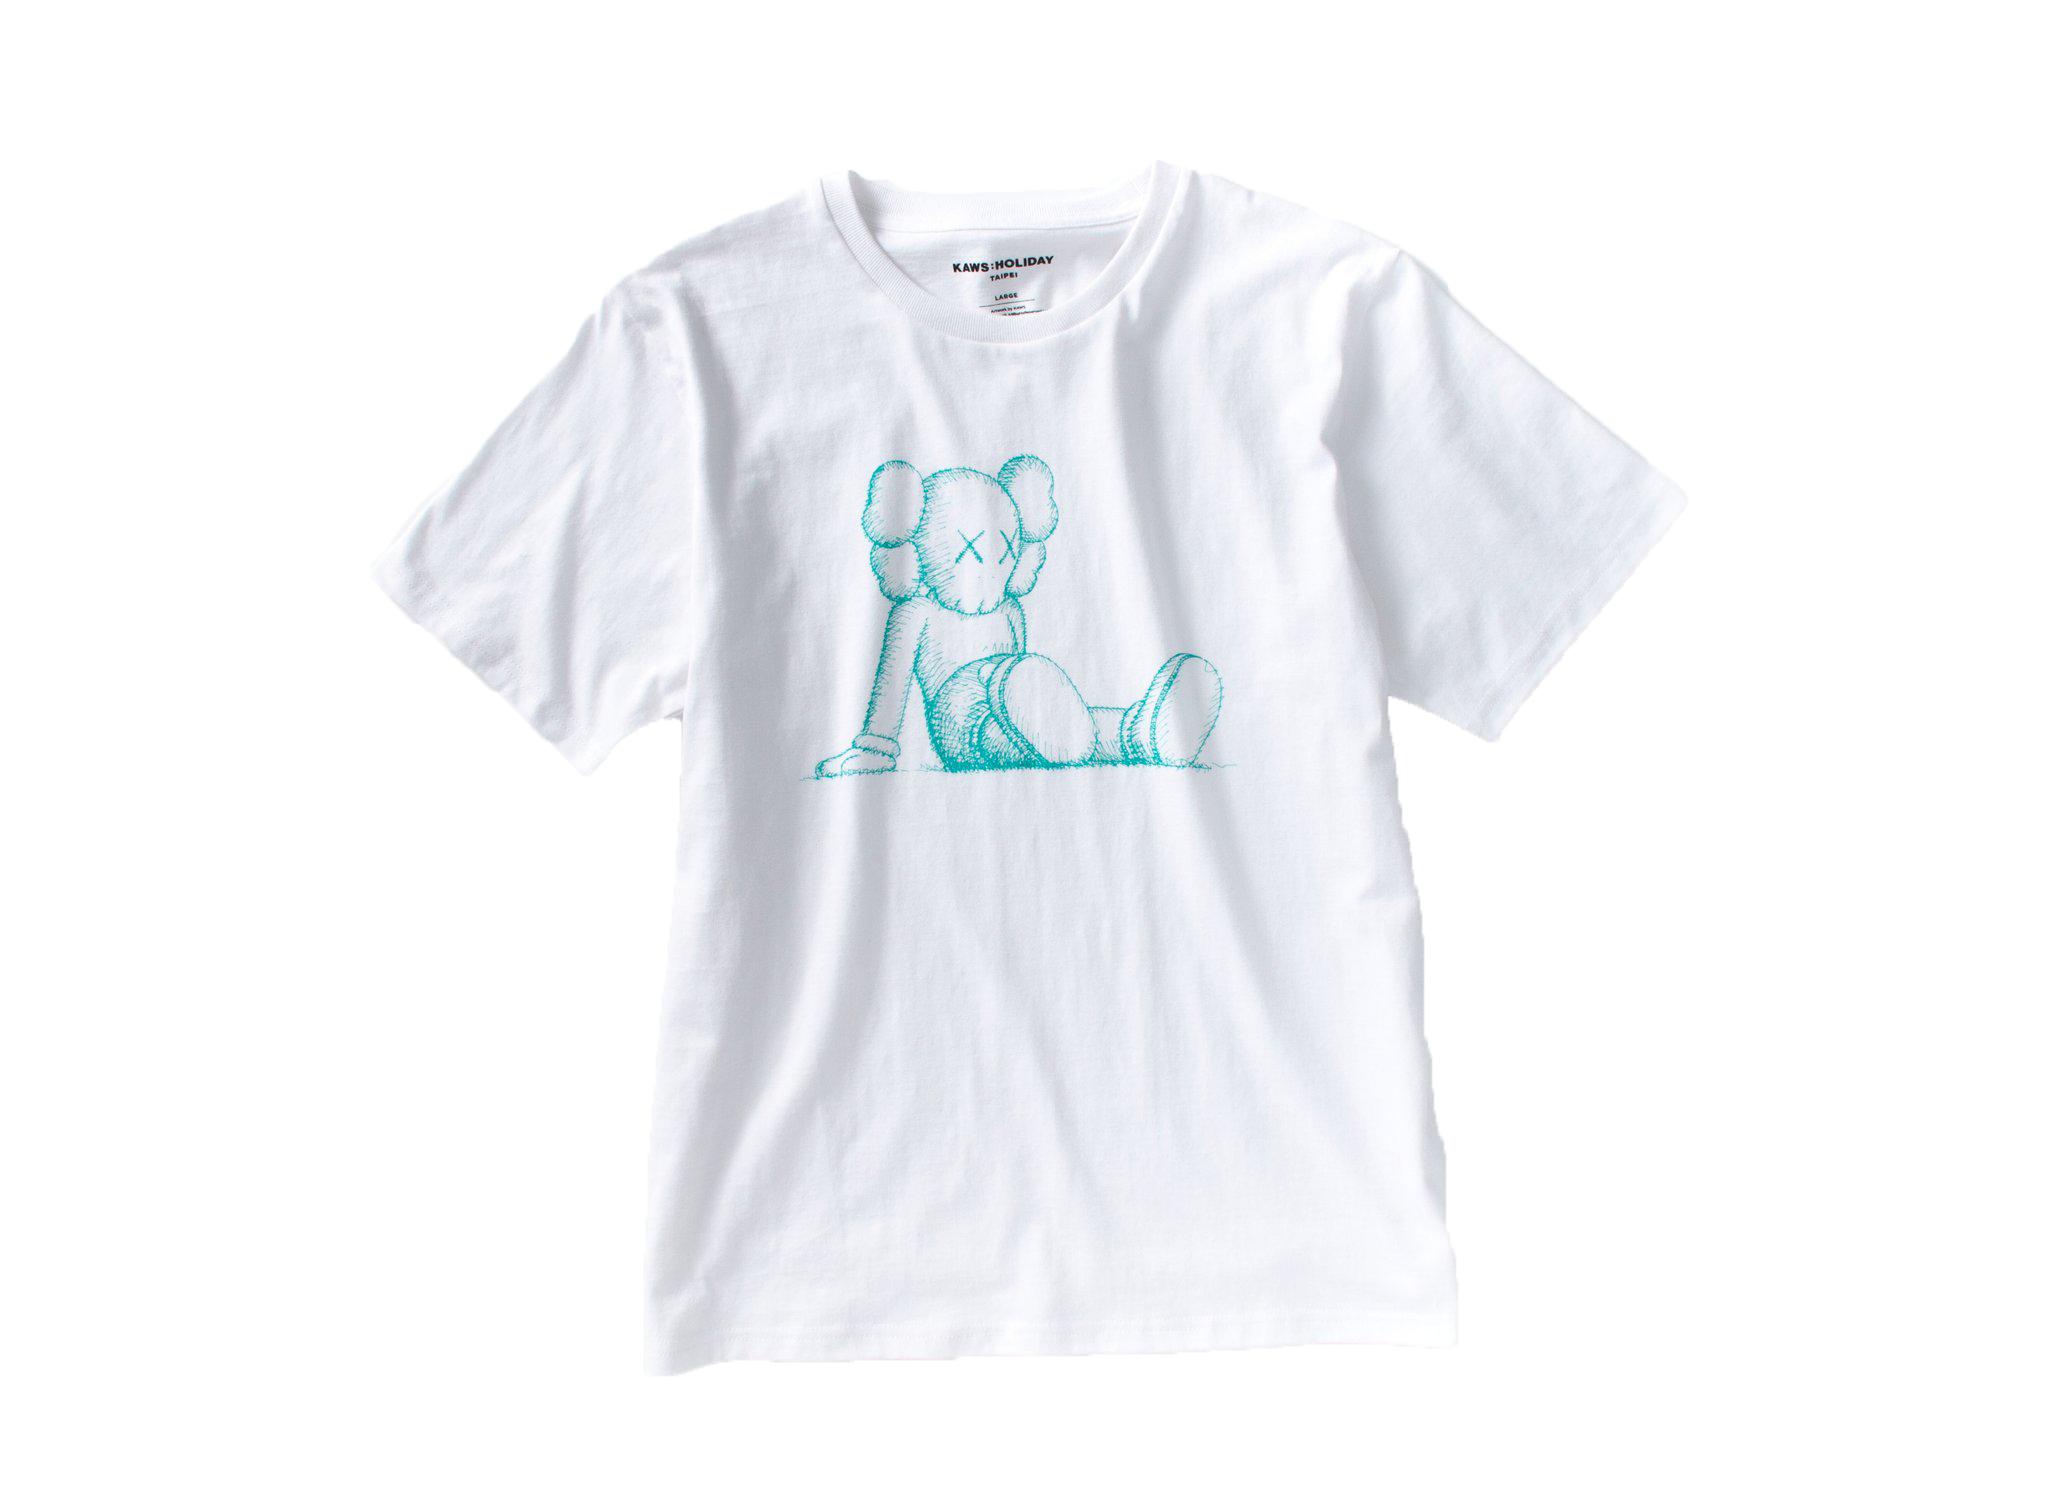 Kaws Holiday Limited Companion T-Shirt White